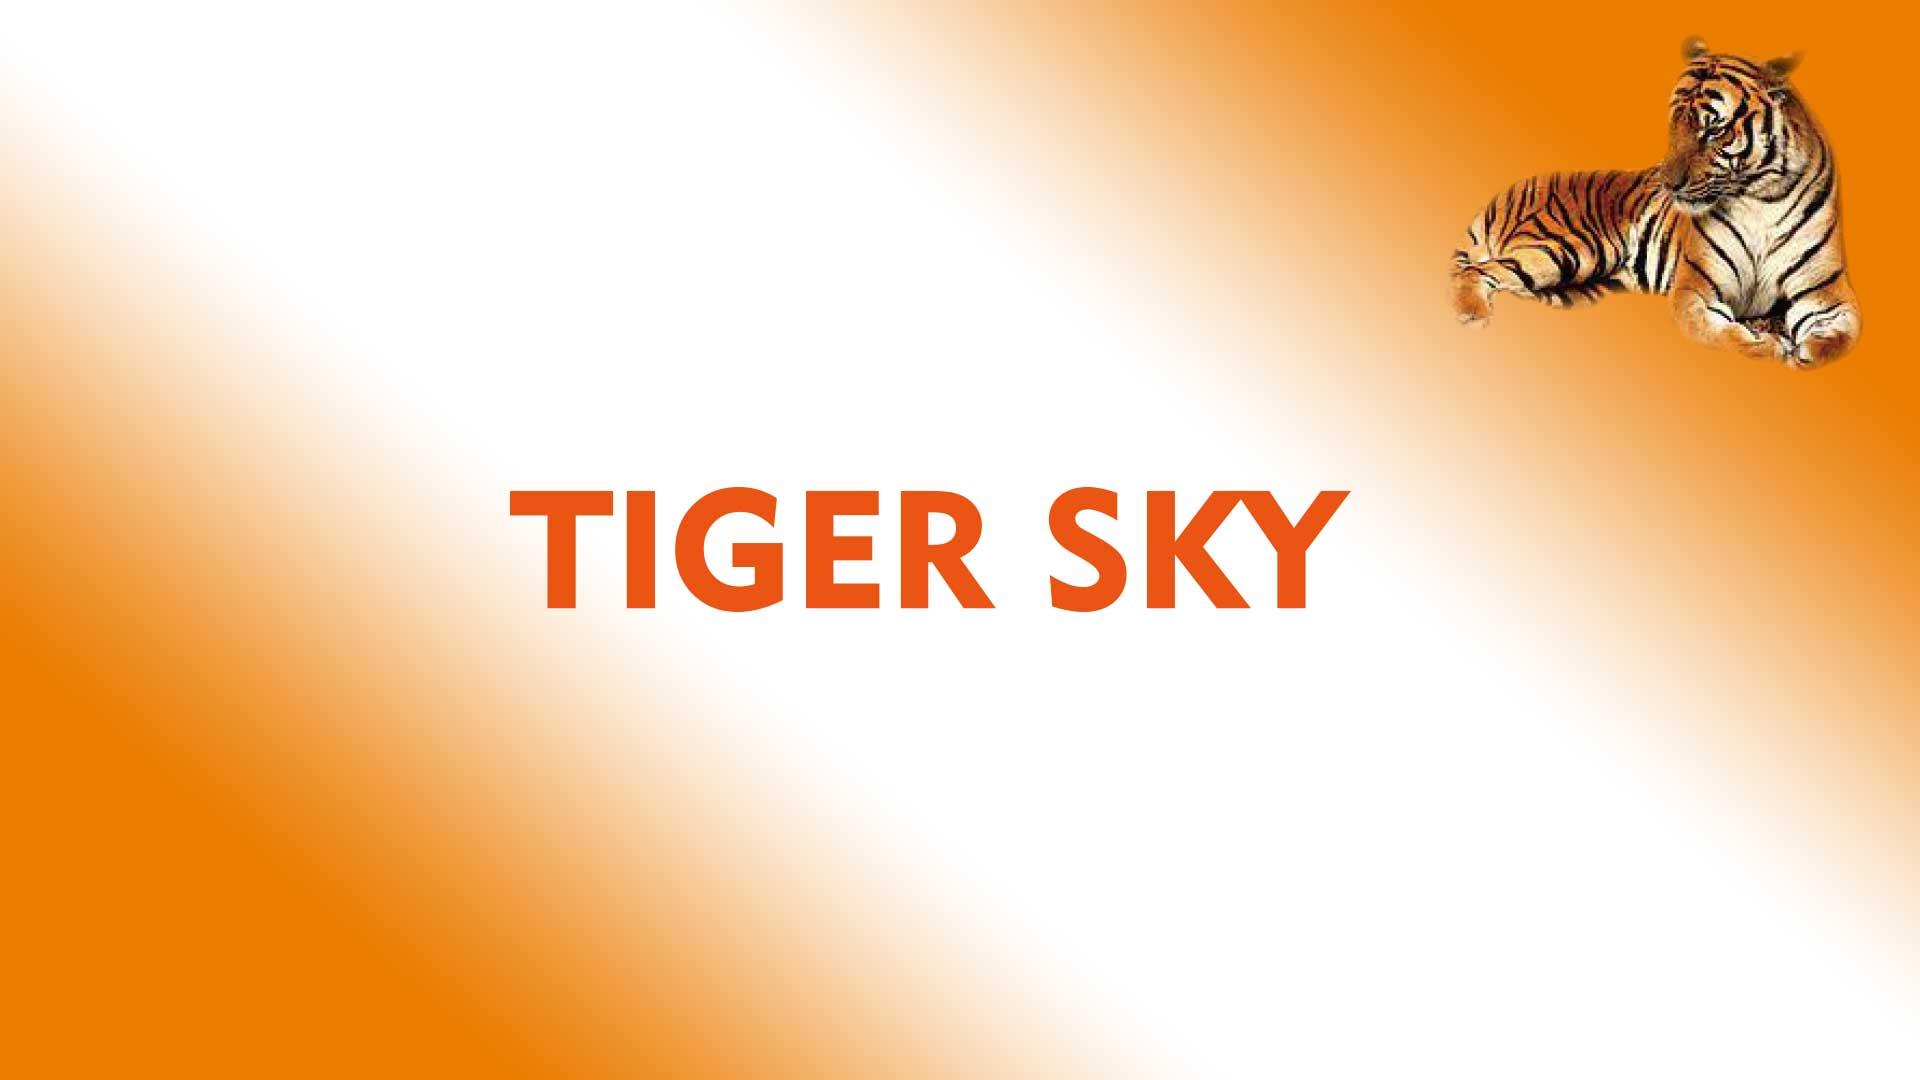 Software Tiger Sky CS8001 New Update Firmware Receiver